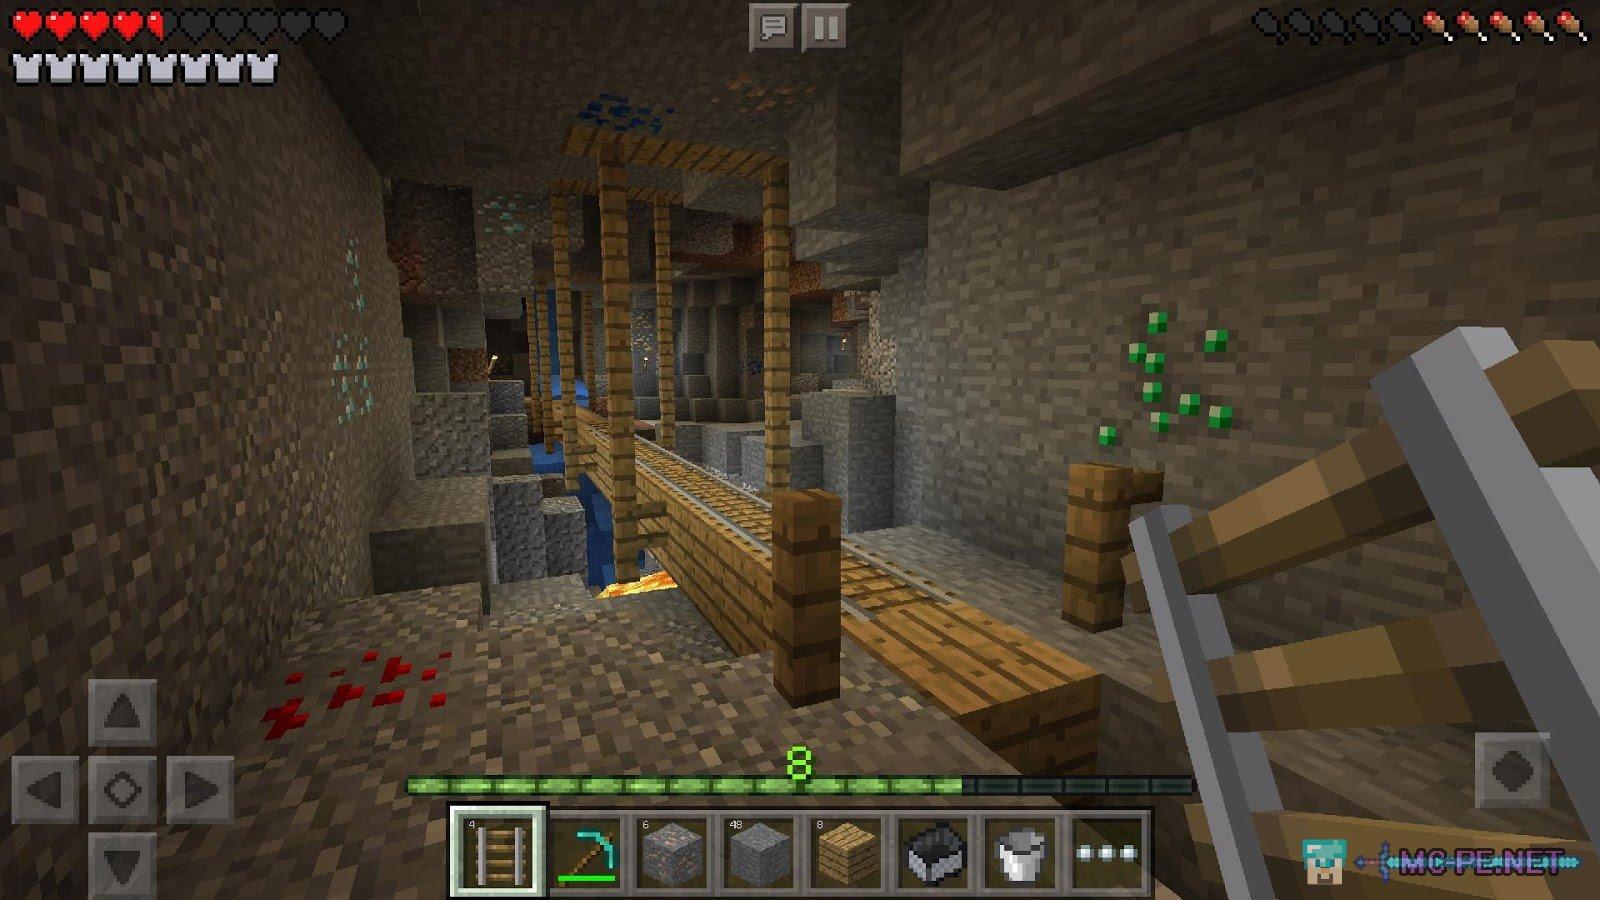 minecraft 1.0.0.16 saf apk indir